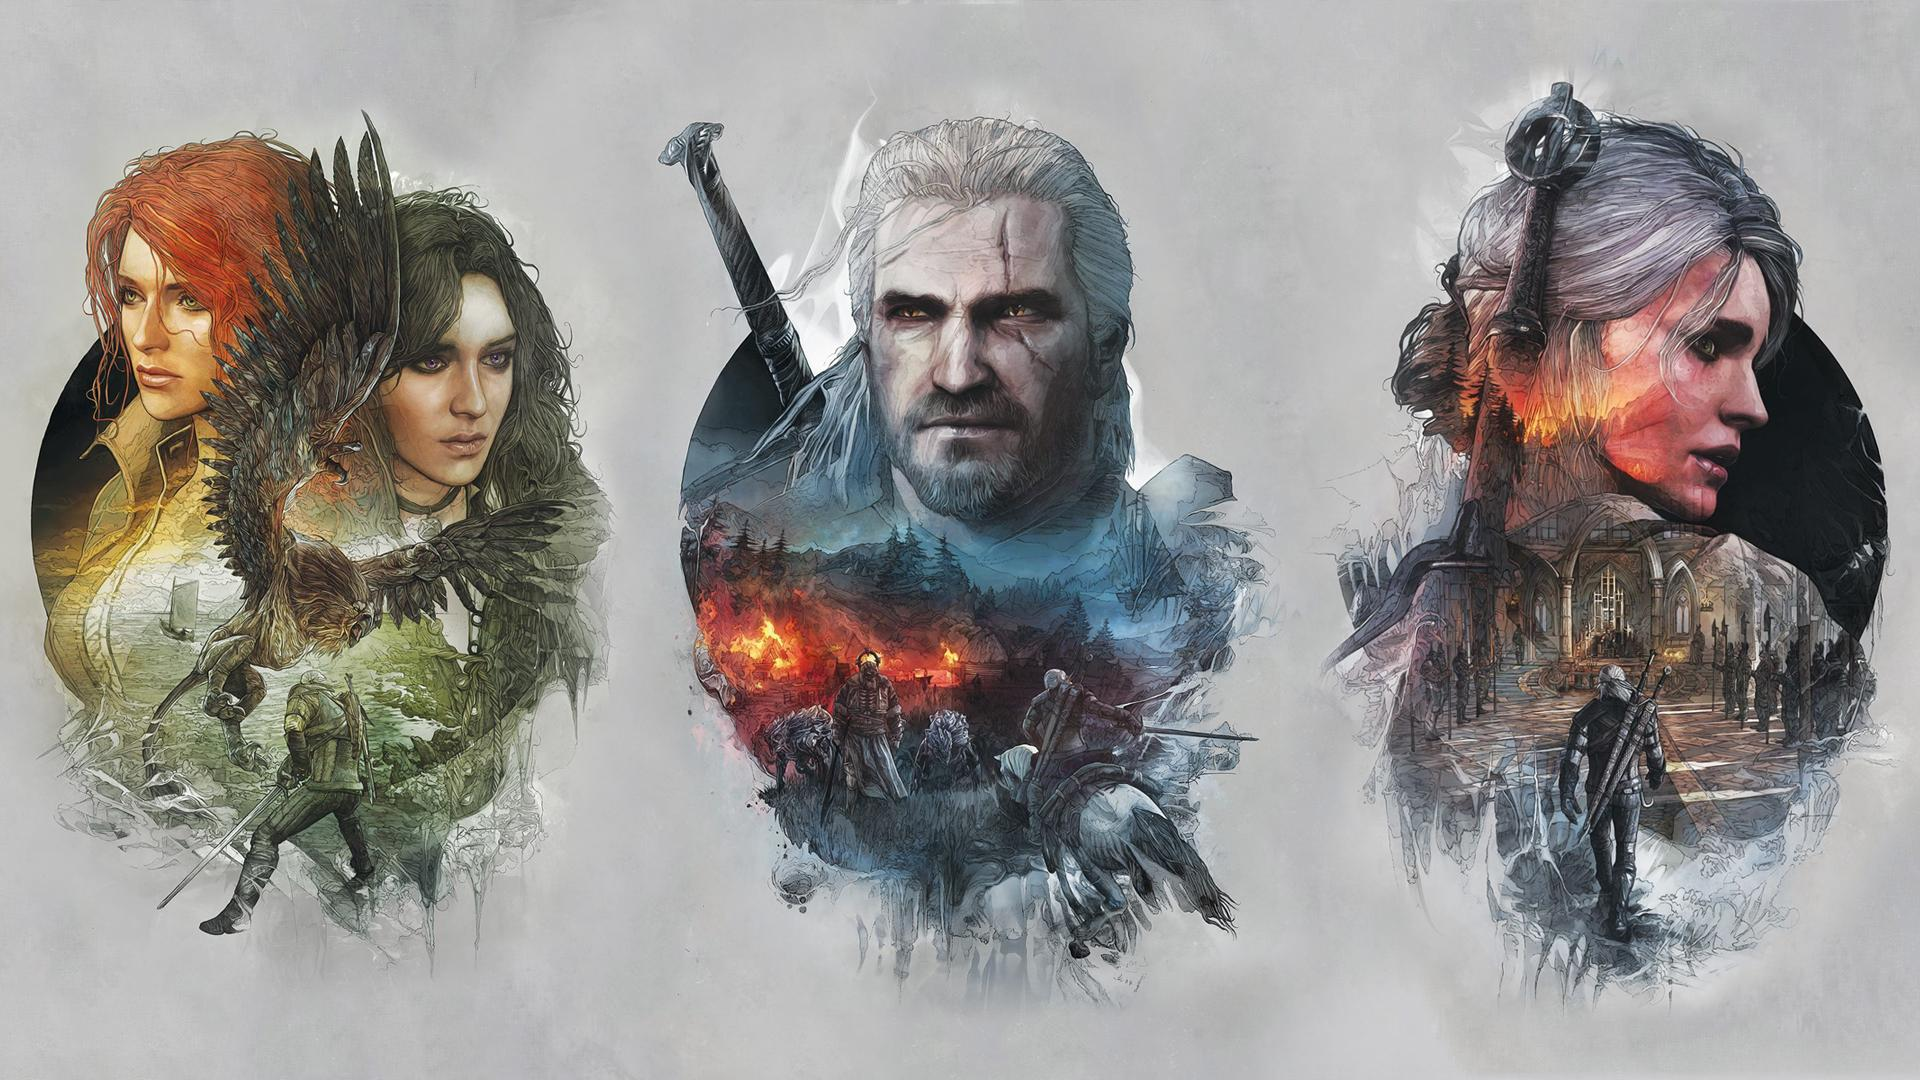 Fiend The Witcher Wild Hunt wallpaper wallpaper free